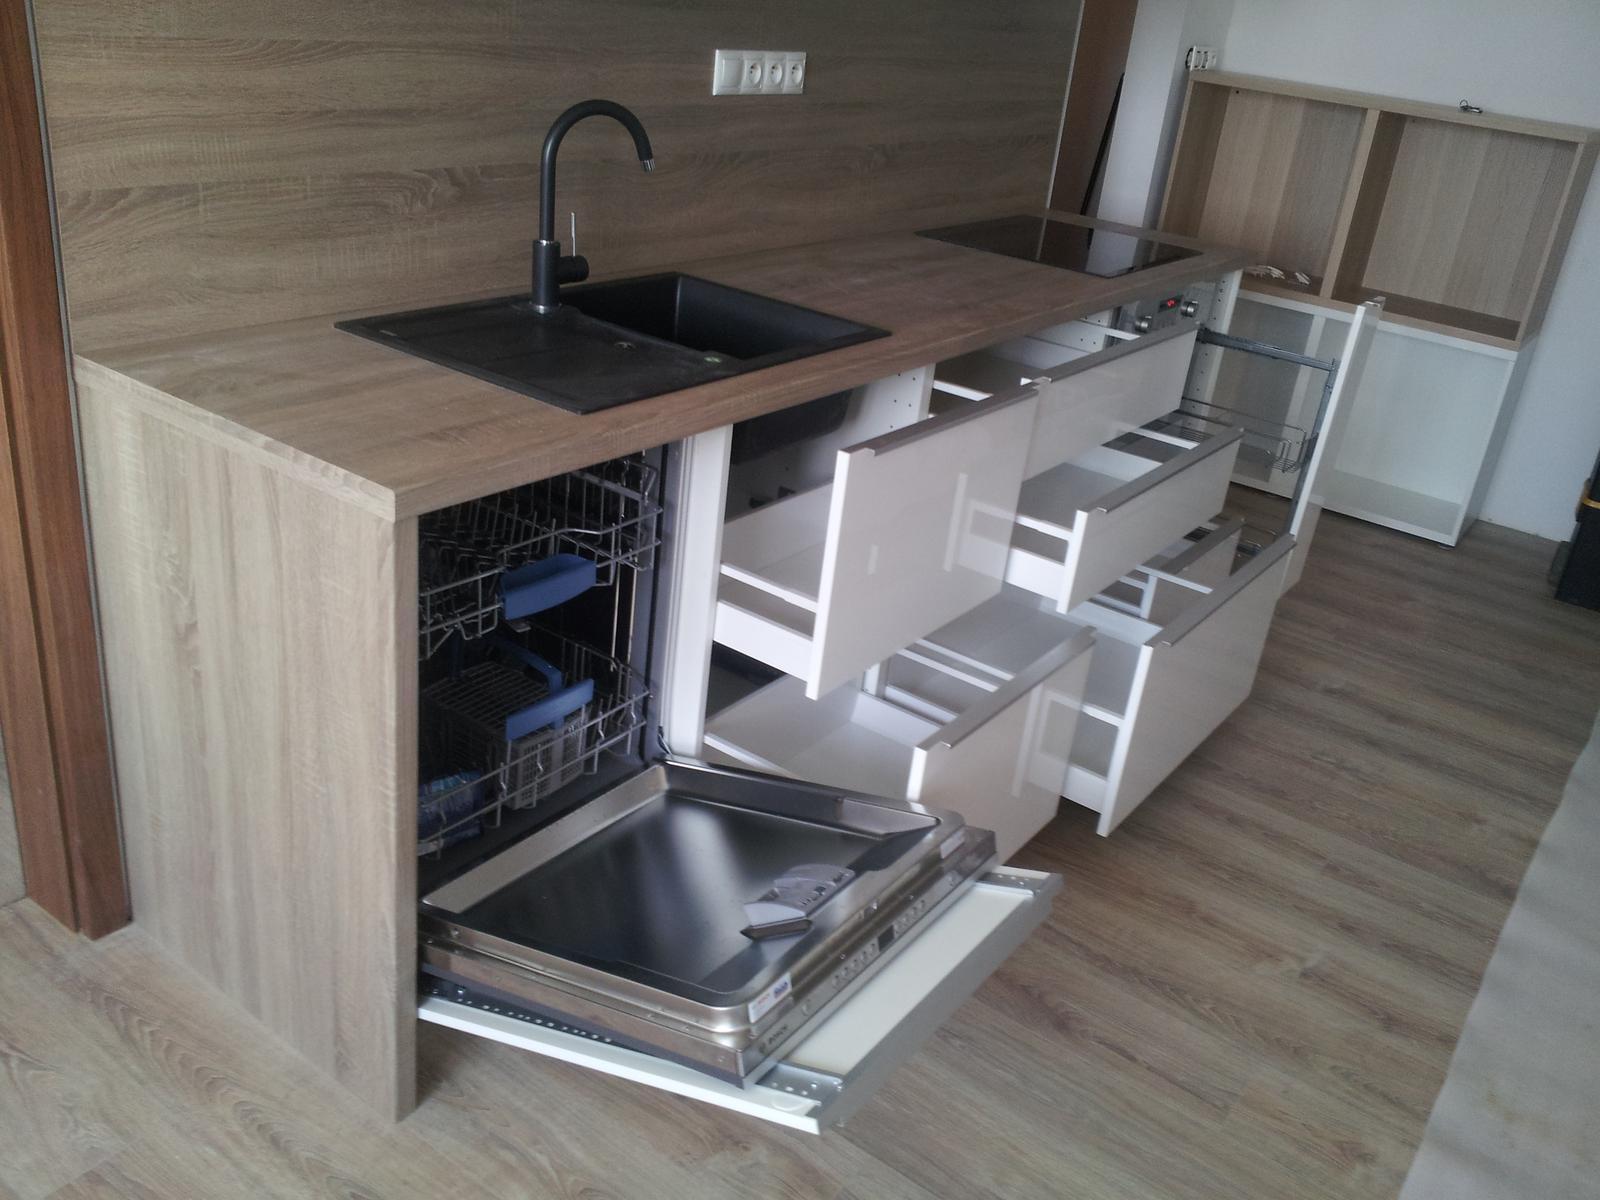 Montáž kuchynskej linky IKEA (Bratislava). - Obrázok č. 11